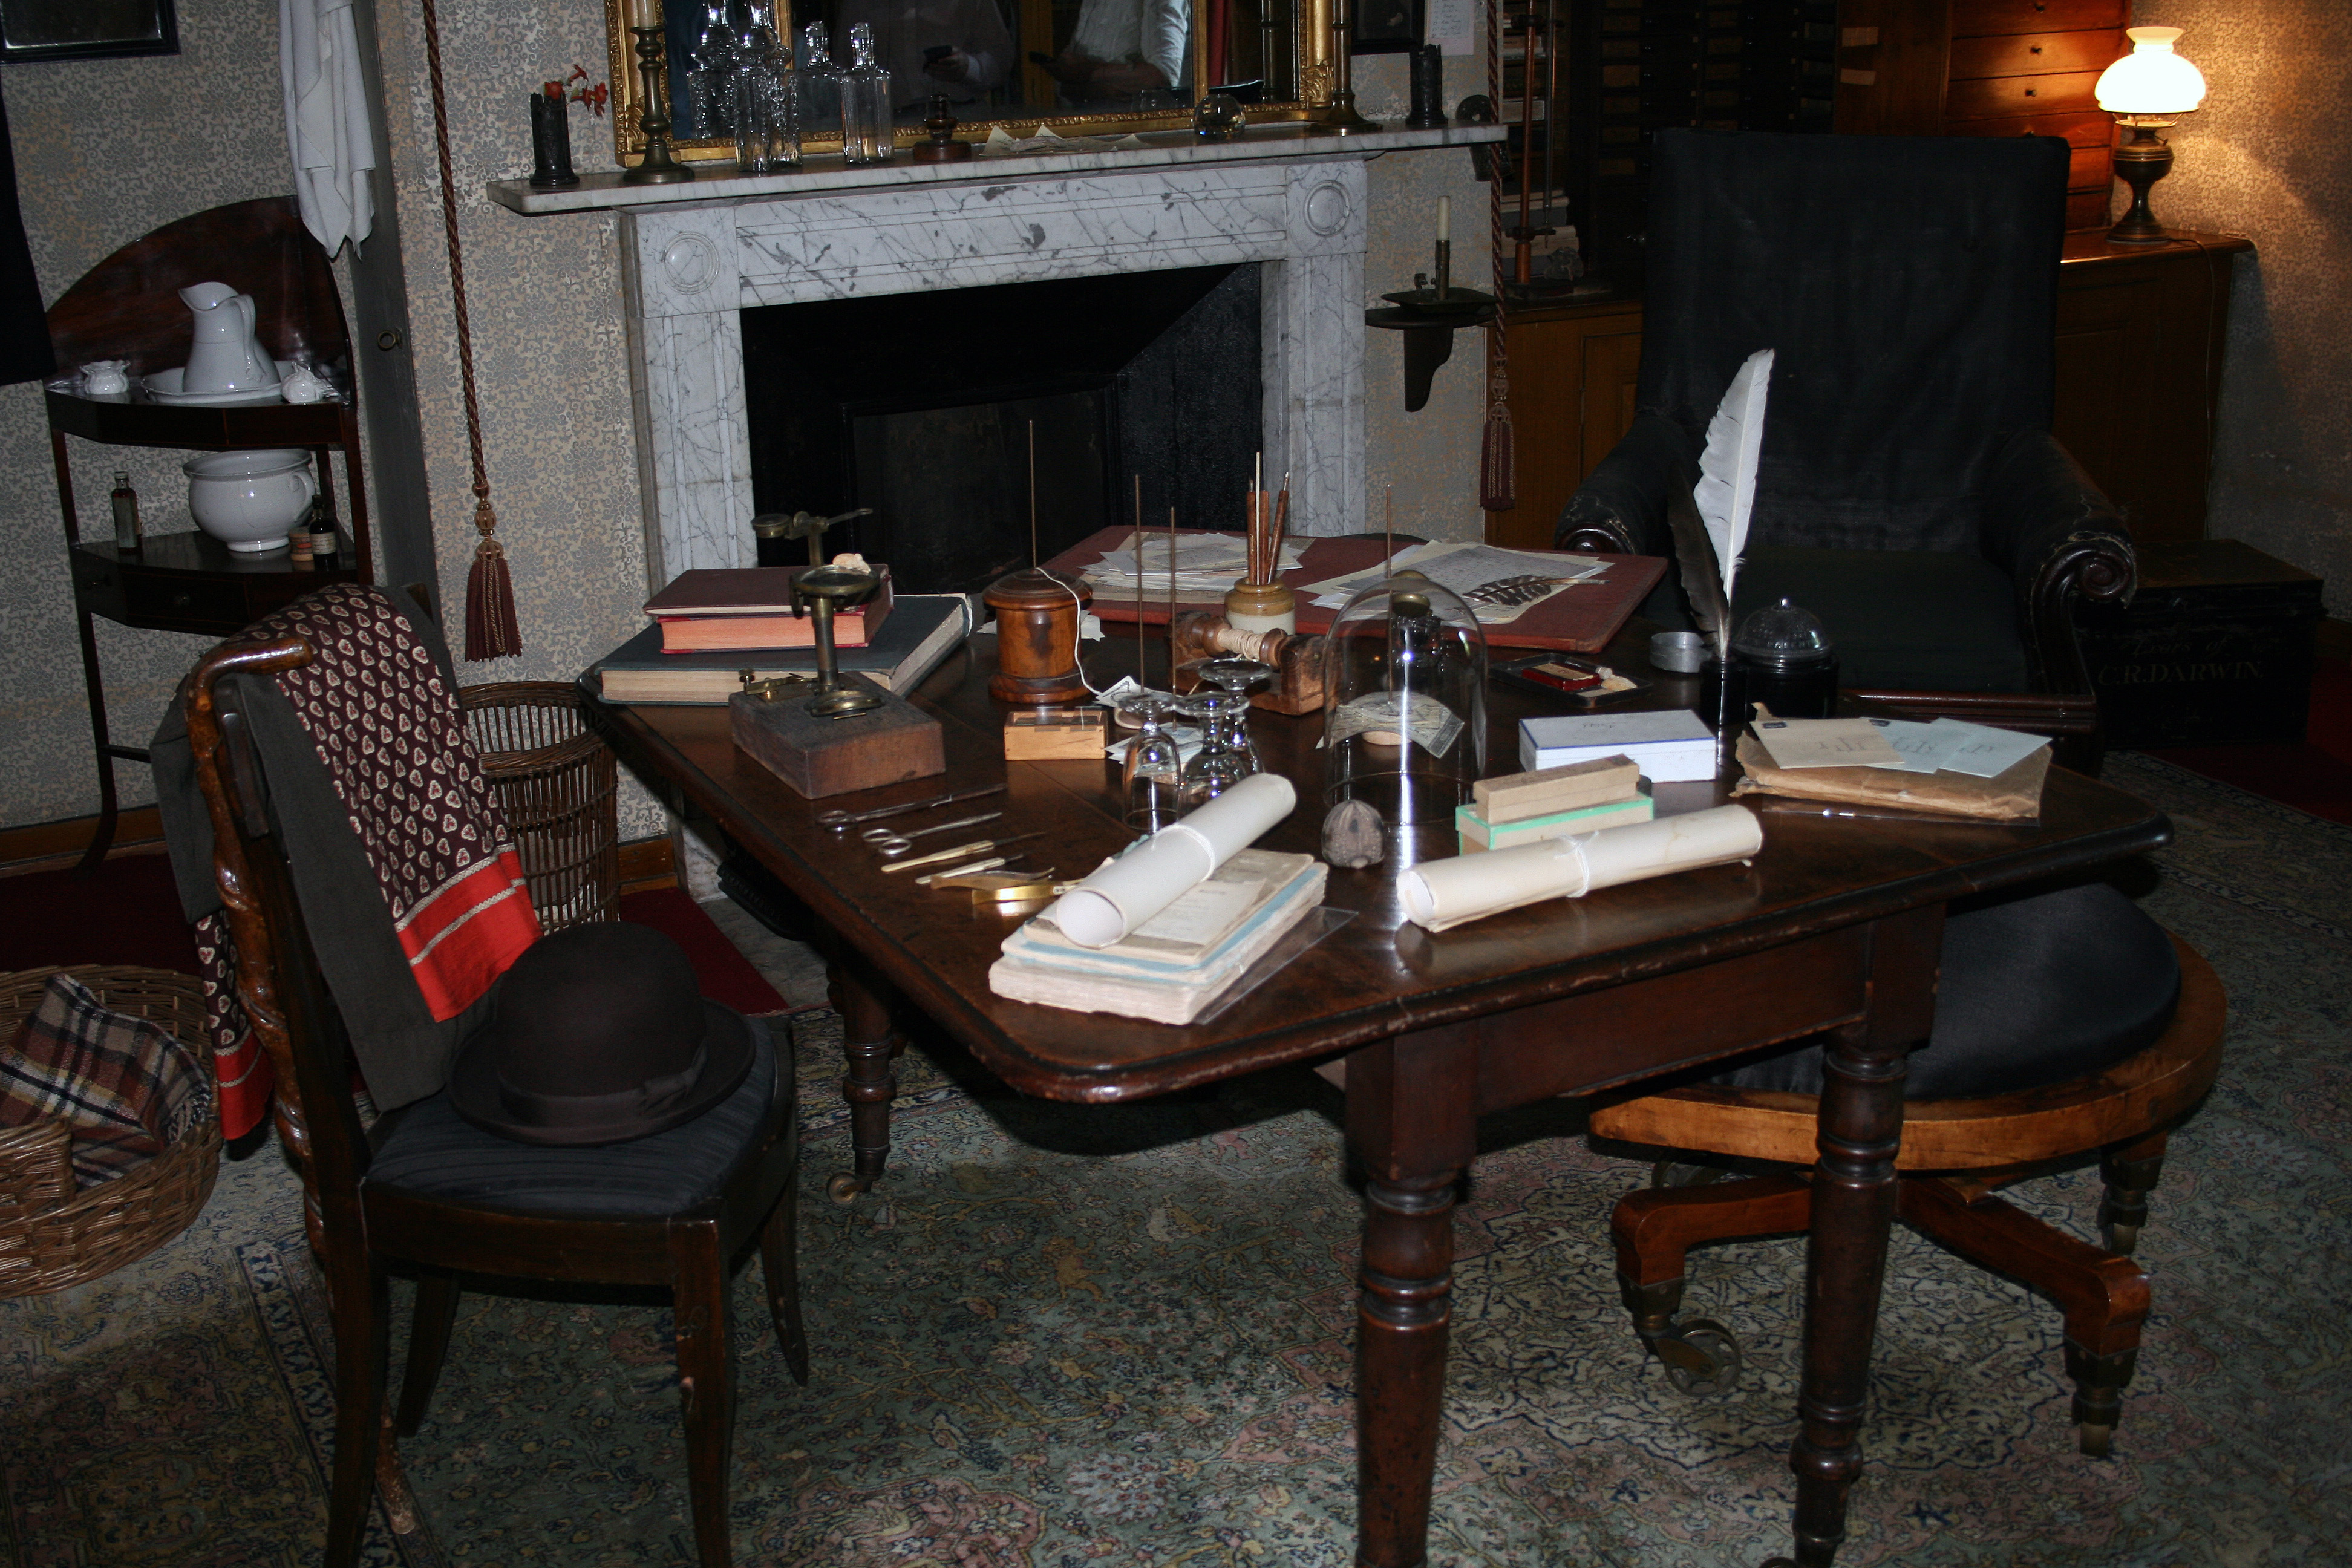 Darwin's study at Down House.Author: Glen, via Wikimedia Commons (CC-BY-2.0)